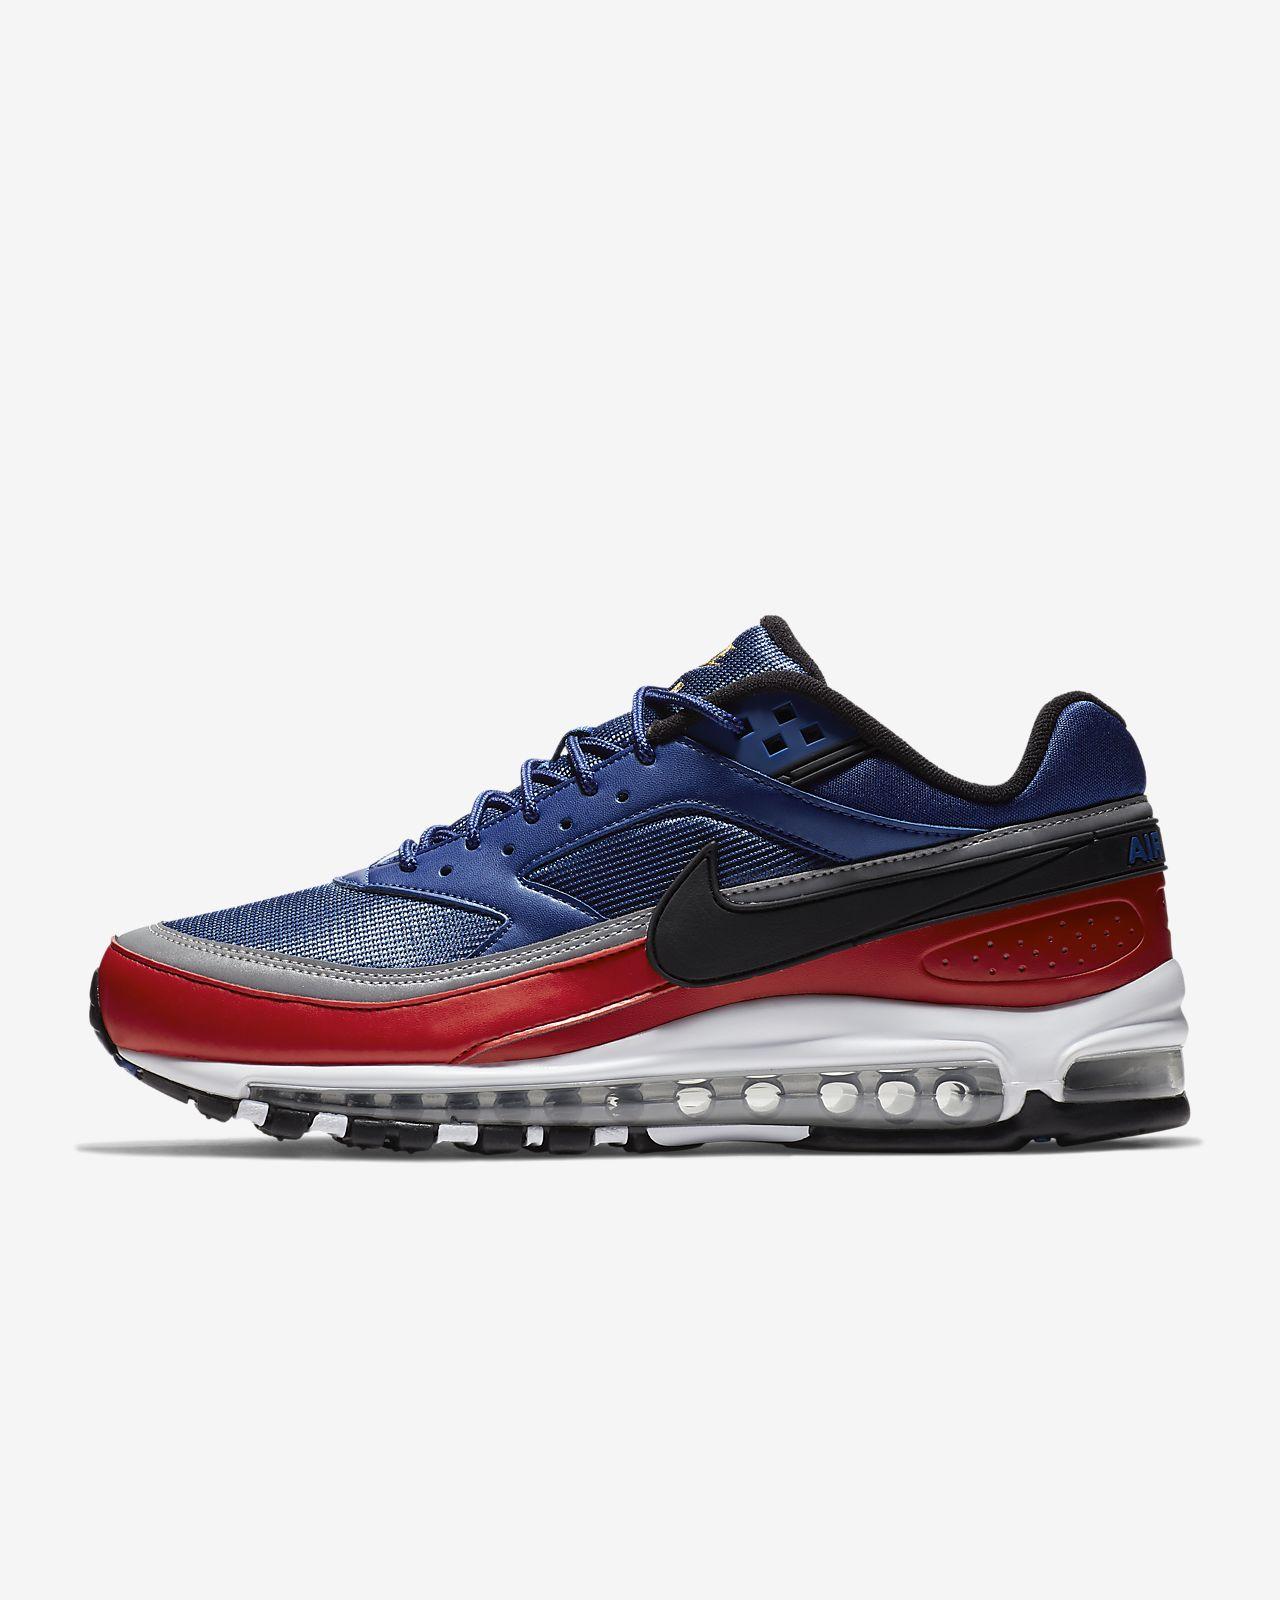 20cbde6b0697 Nike Air Max 97 BW Men s Shoe. Nike.com GB